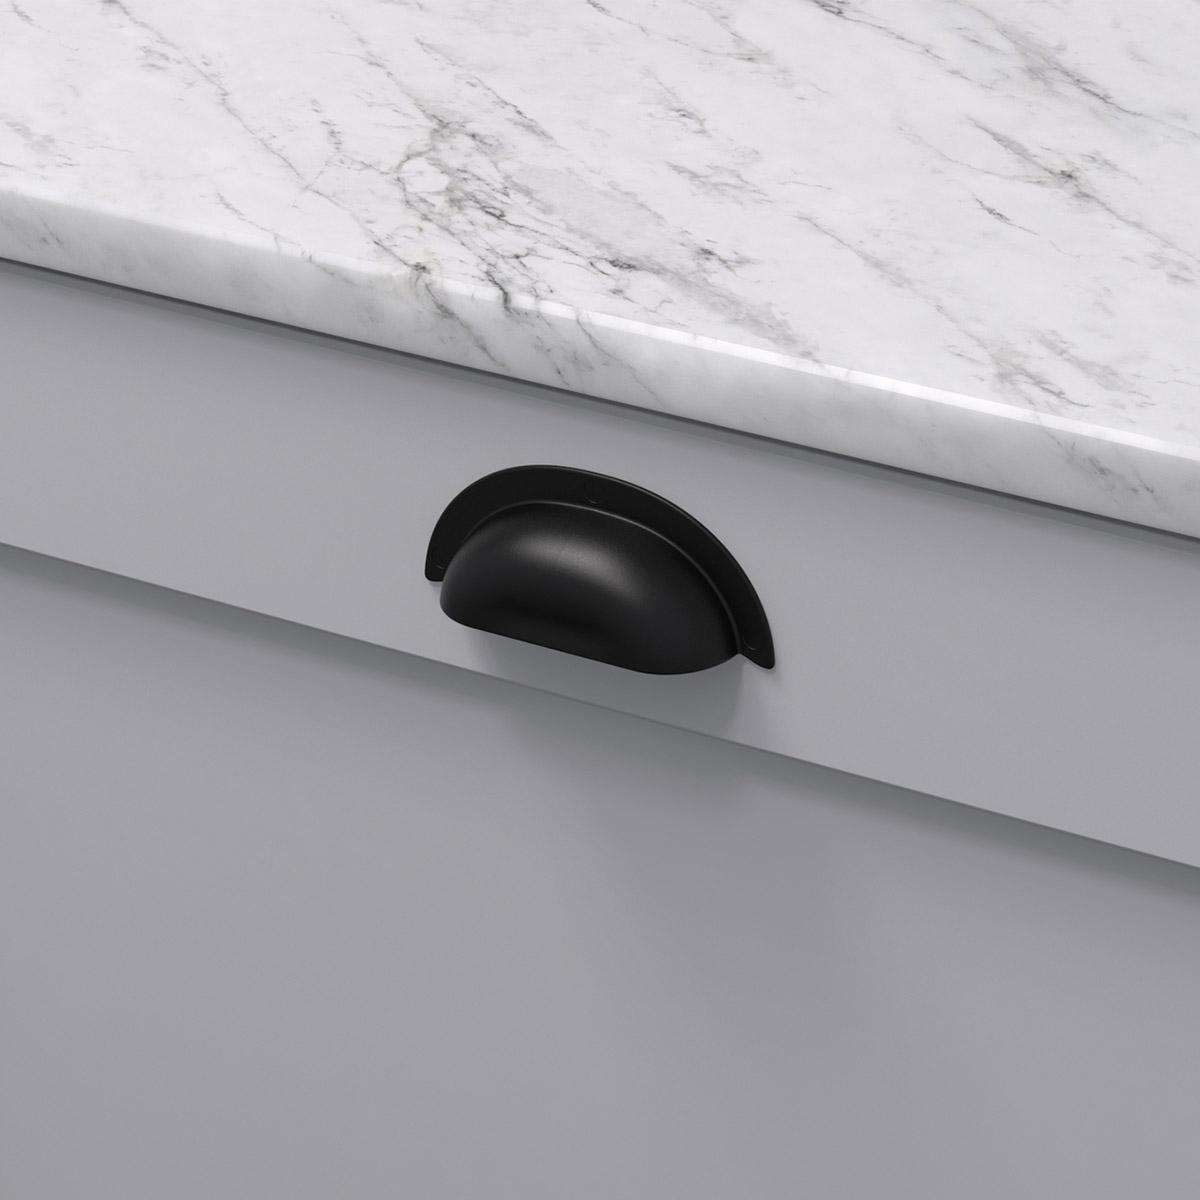 Skålhand 3922 antik svart 39224 11 ncs s 3000 n marmor carrara